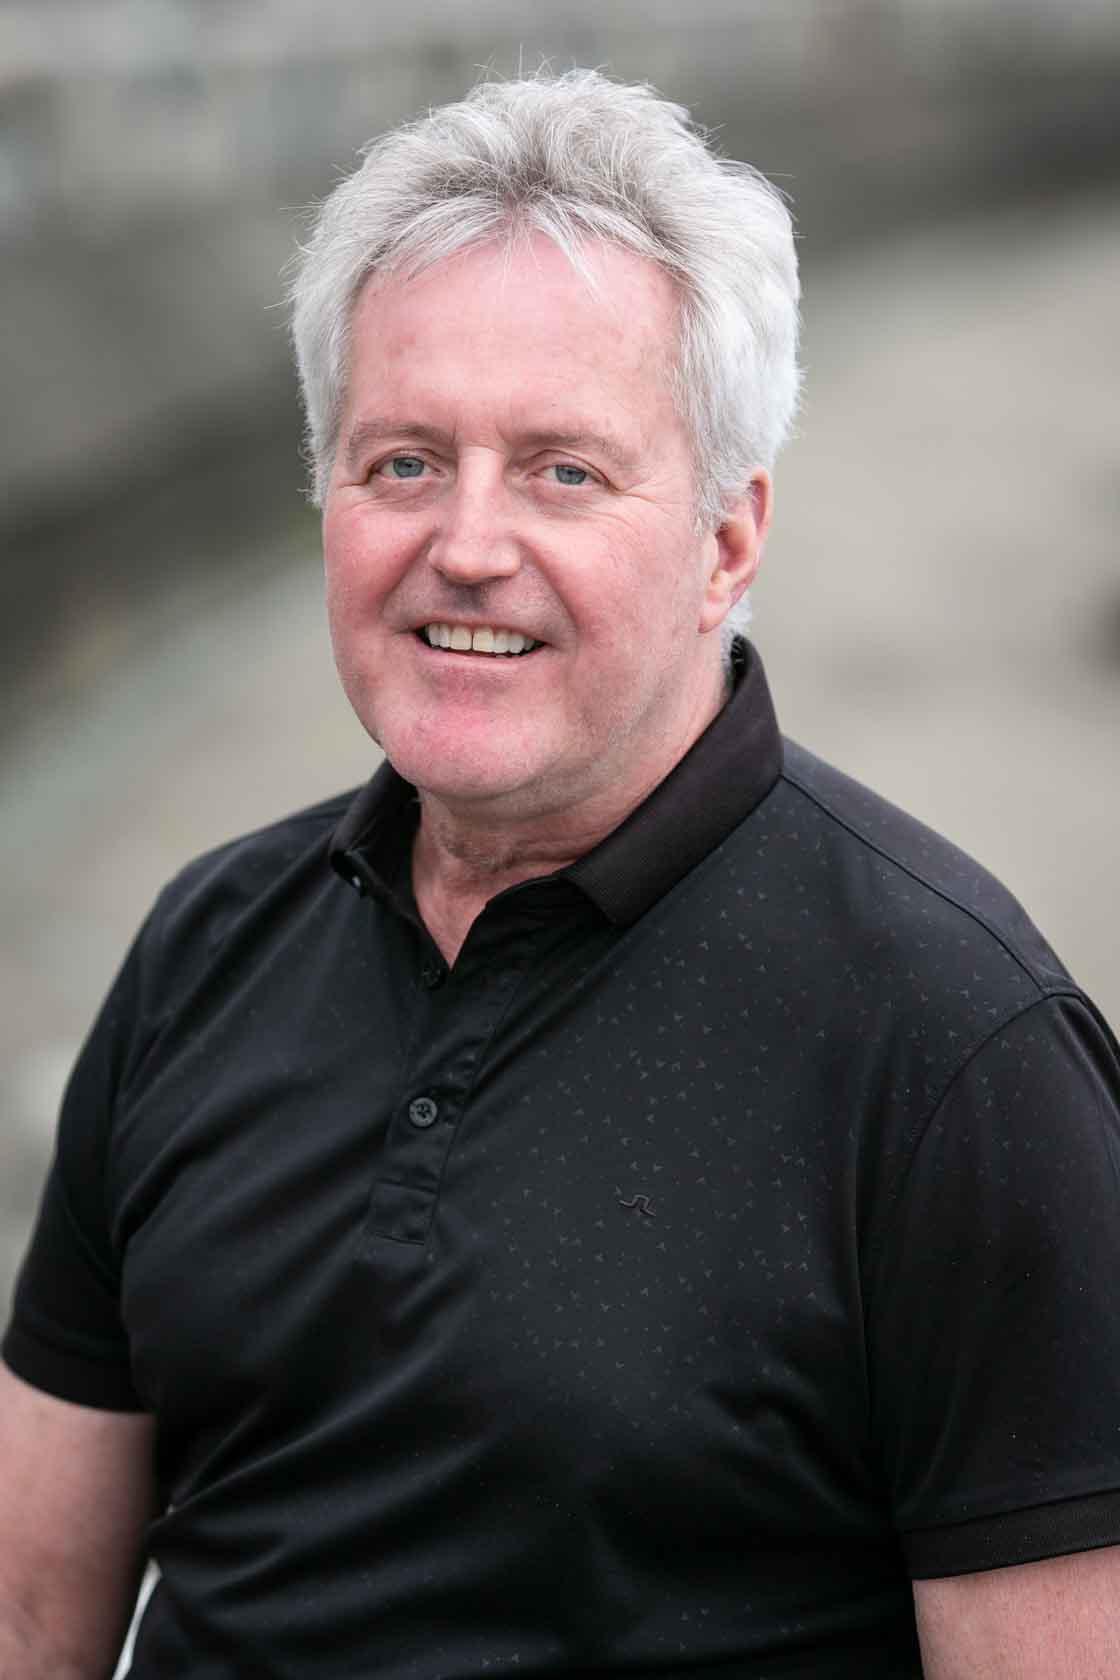 dr mark spooner, dentist in north vancouver